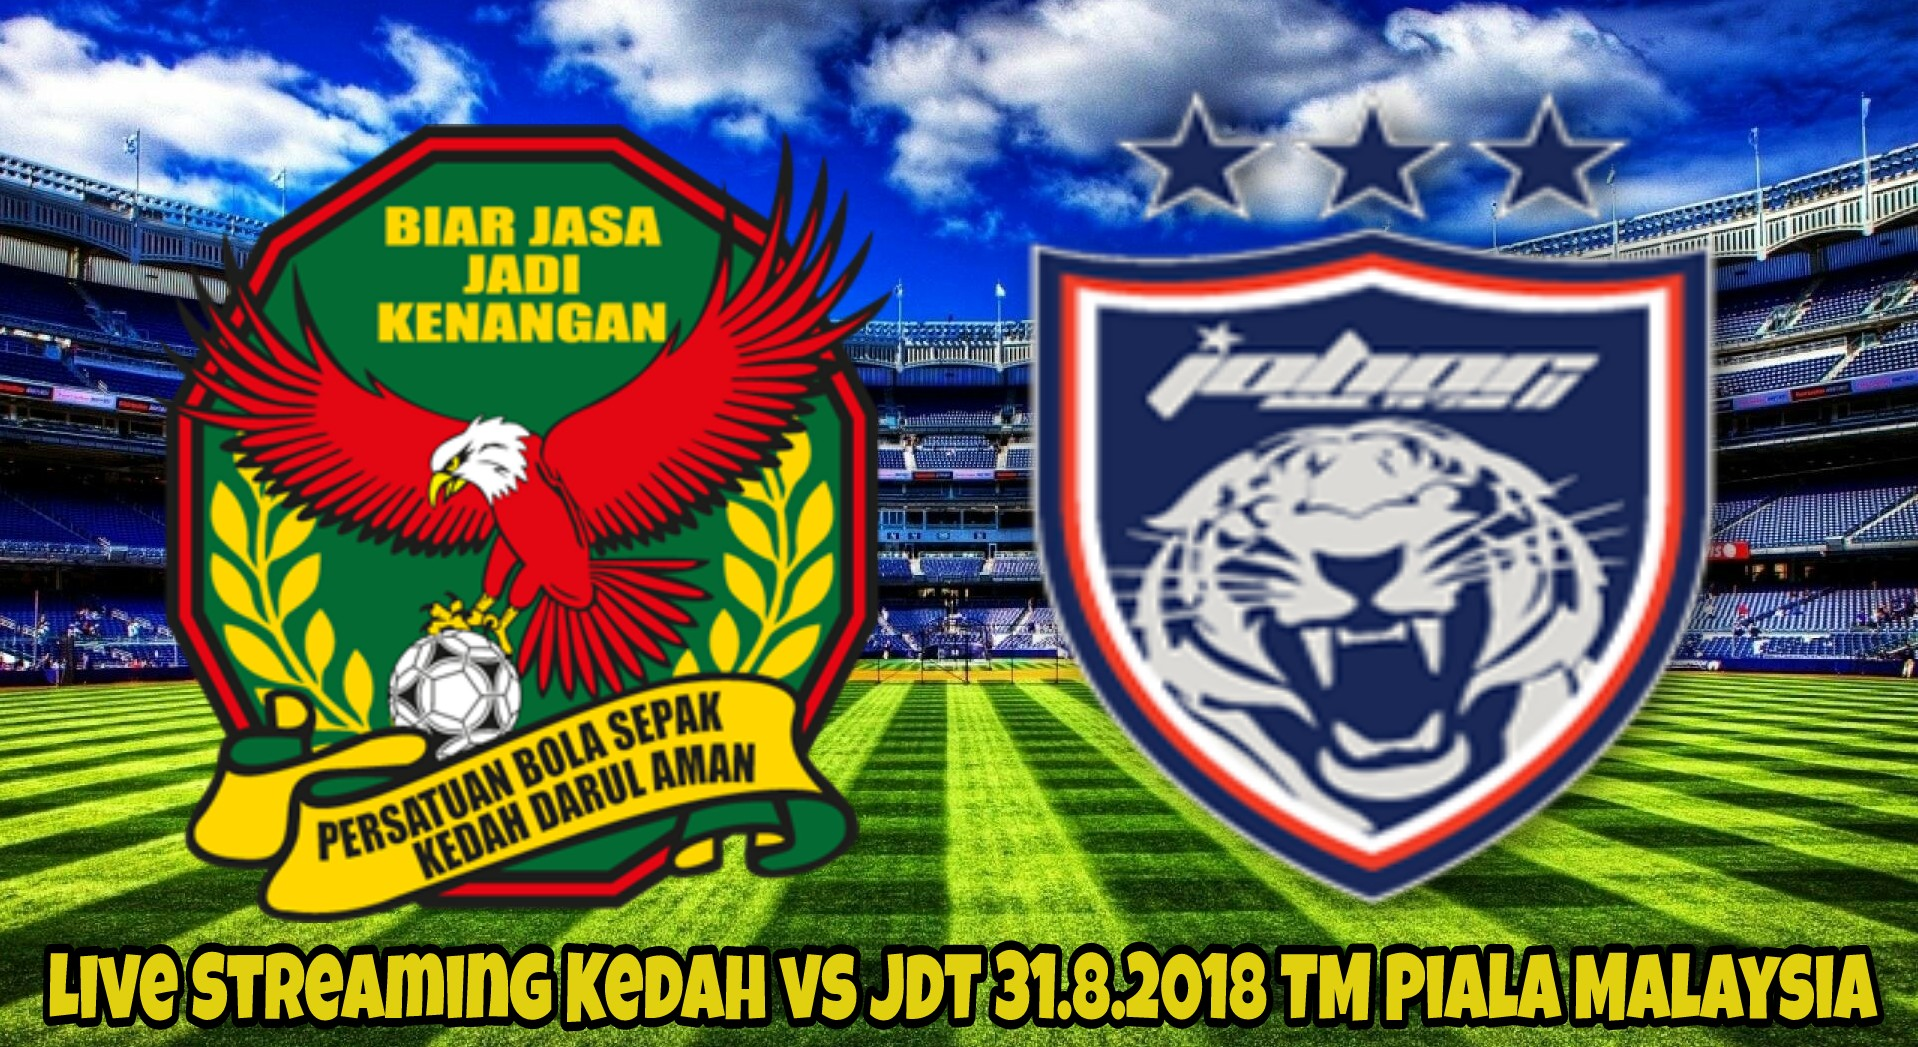 Live Streaming Kedah vs JDT 31.8.2018 TM Piala Malaysia